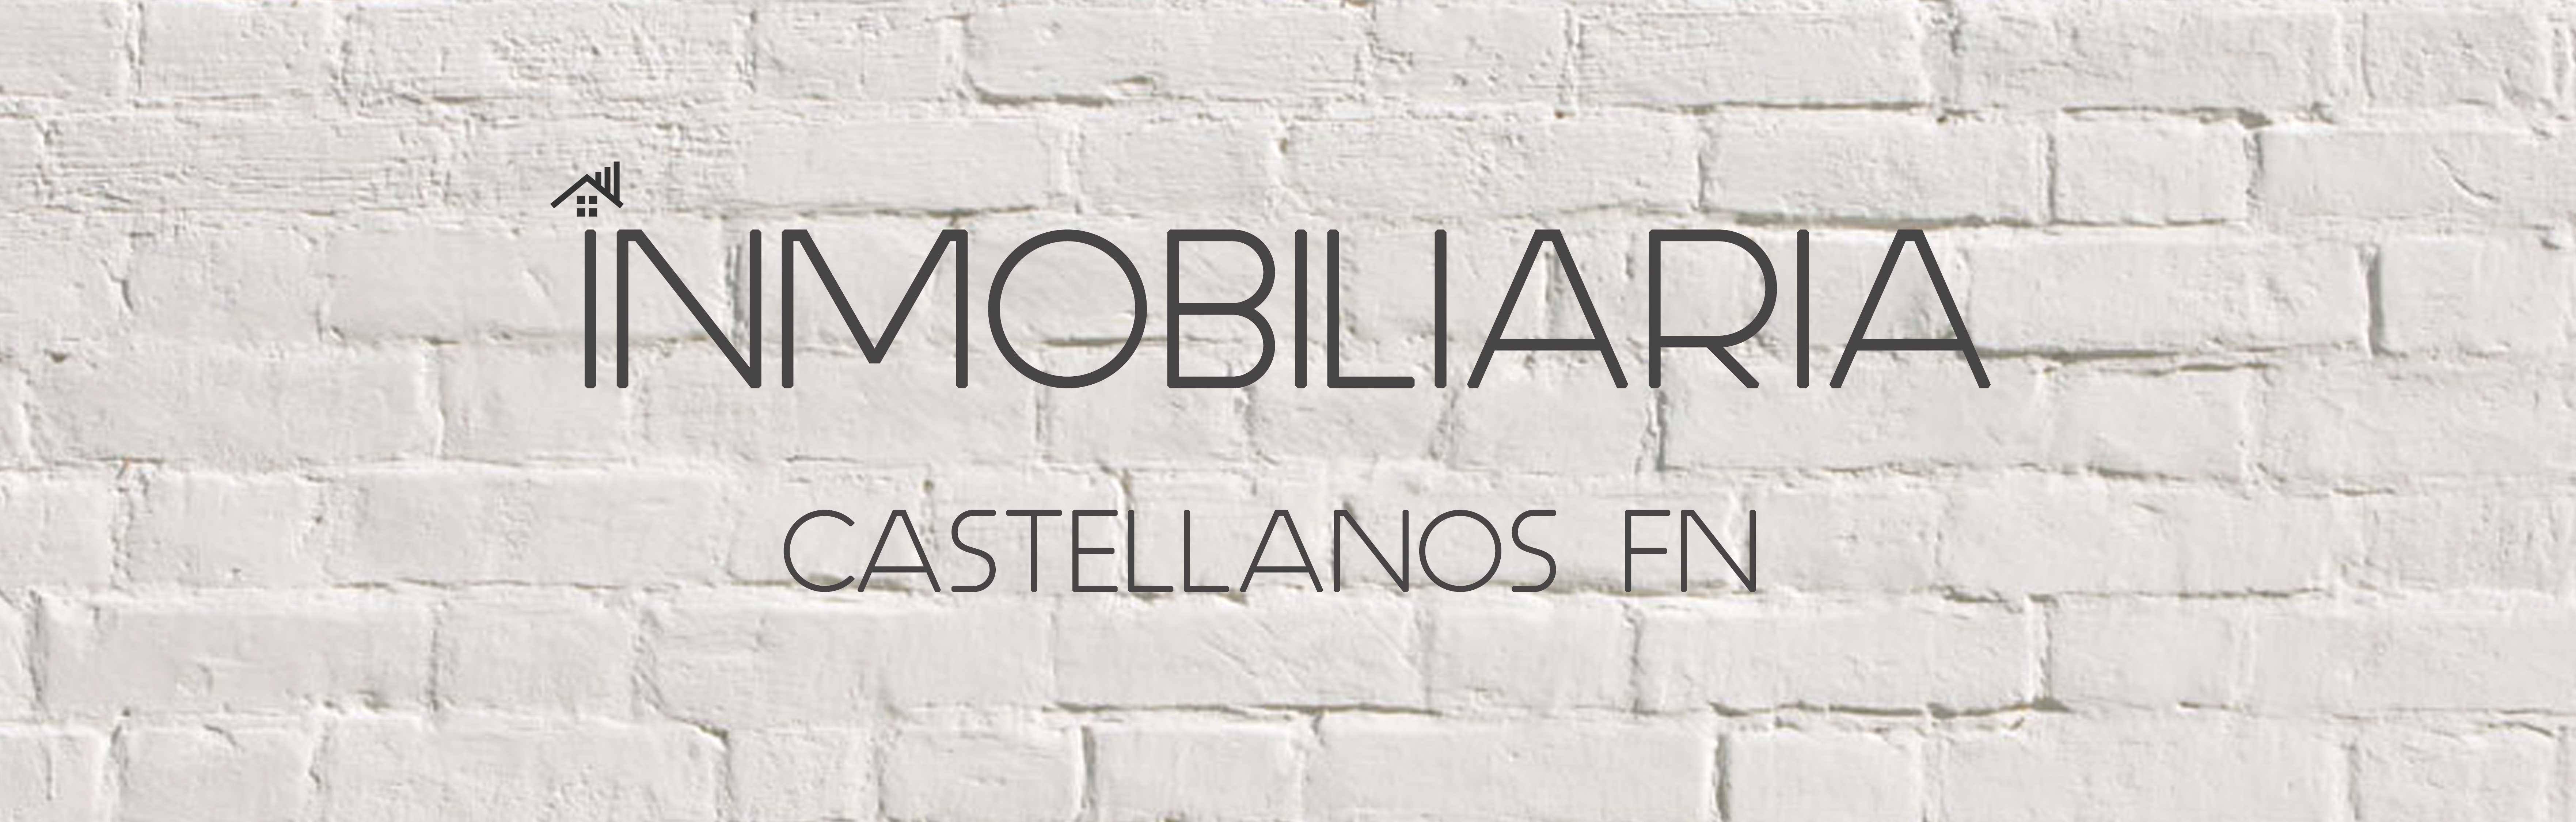 Inmobiliaria Castellanos de Moriscos